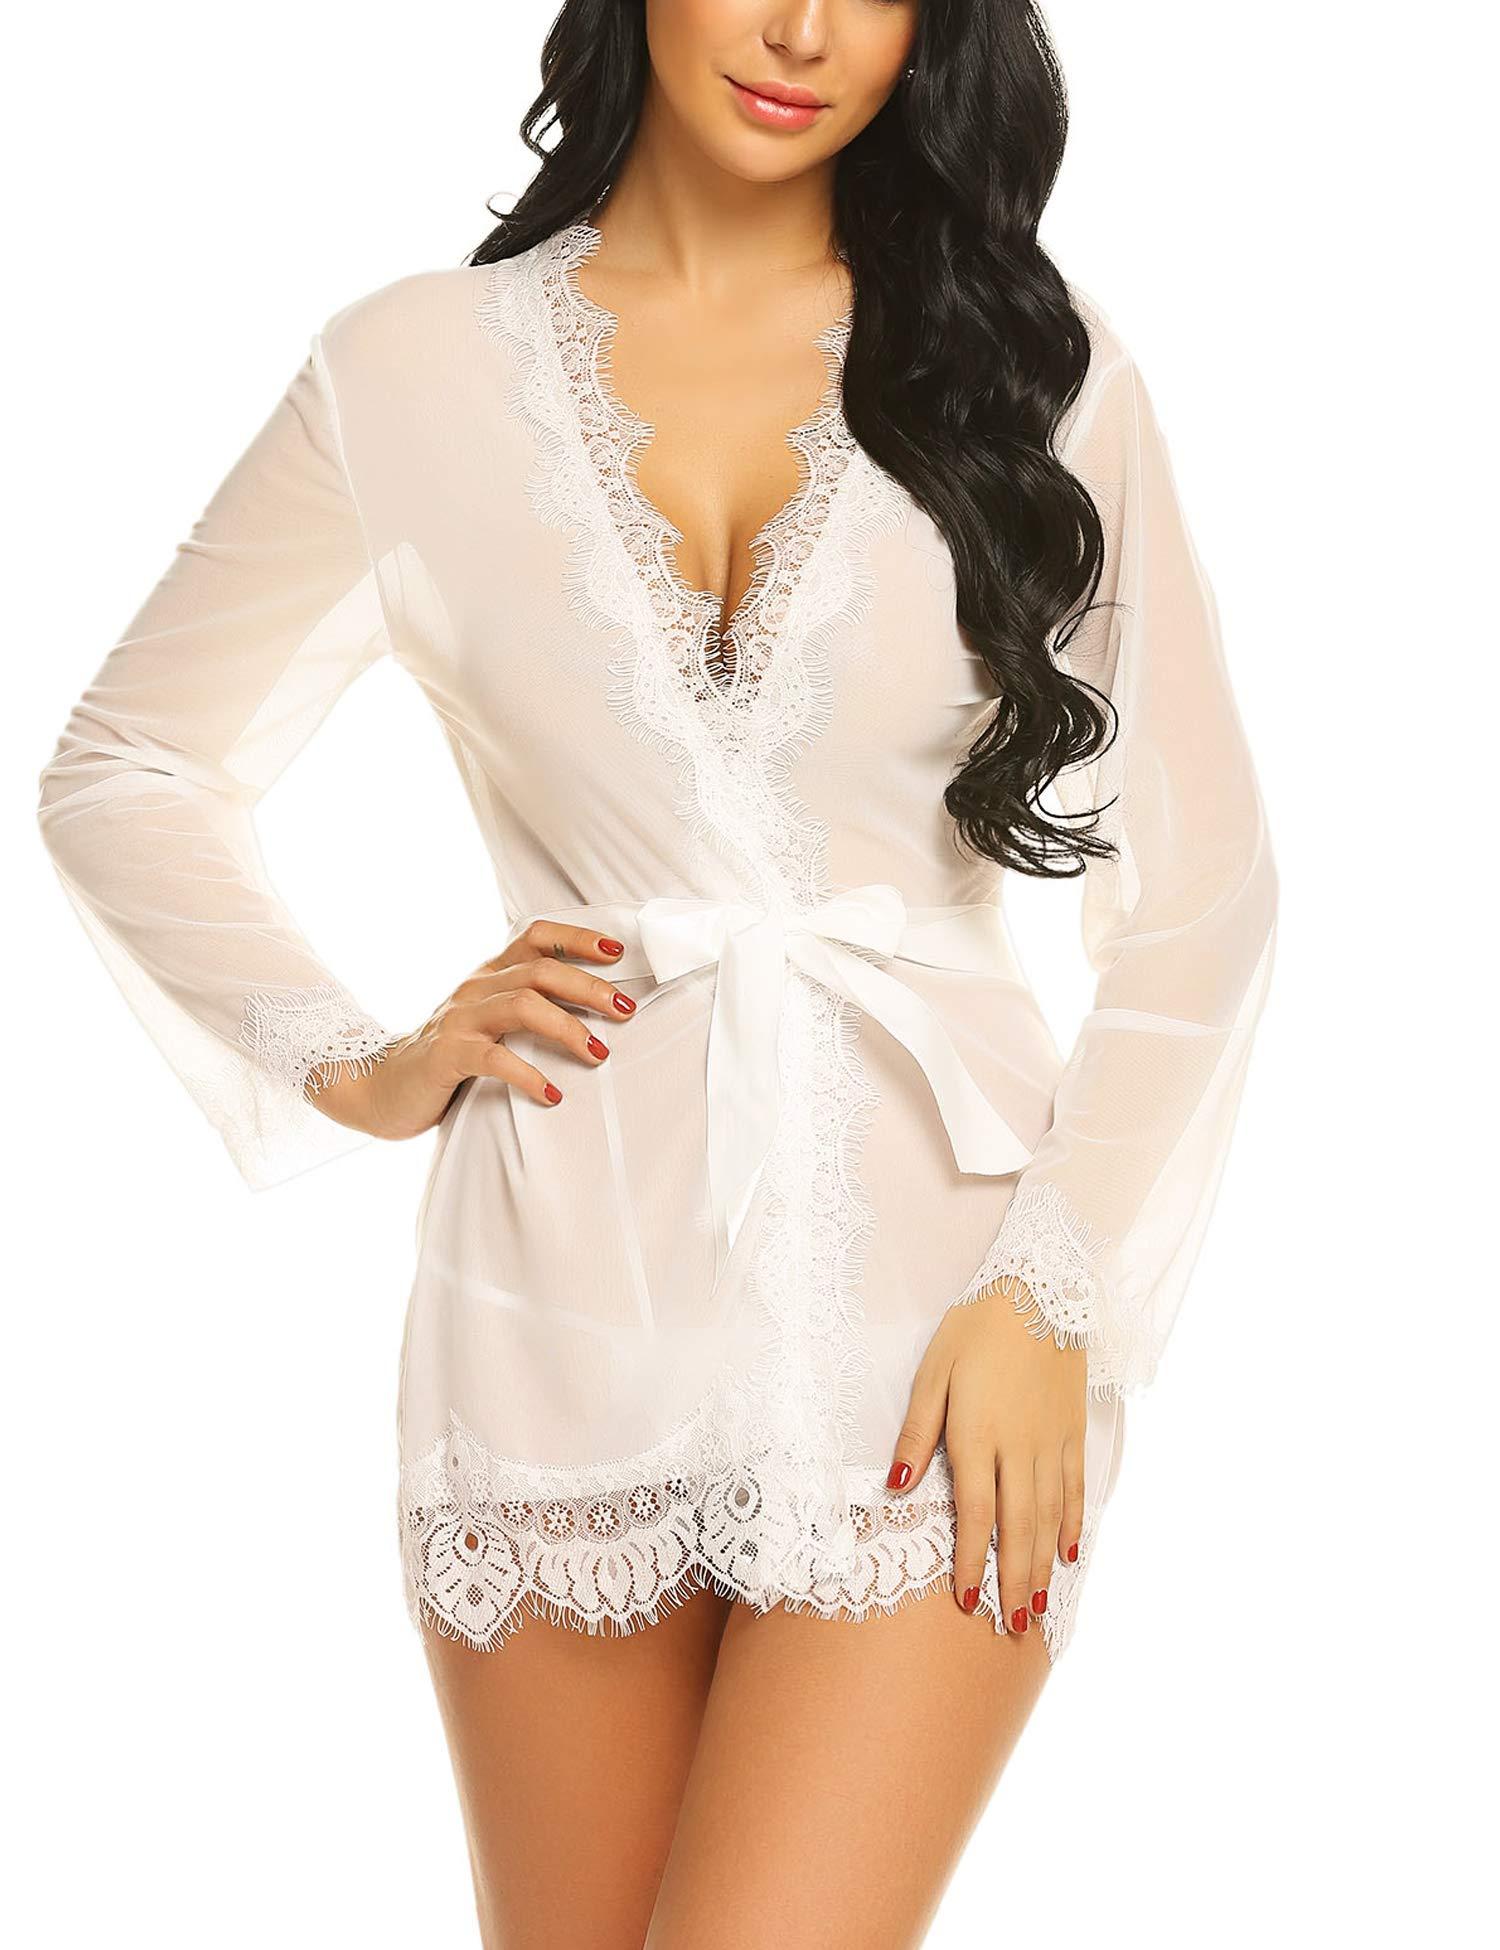 Avidlove Women's Lace Kimono Robe Mesh Babydoll Lingerie Chemise White XXL